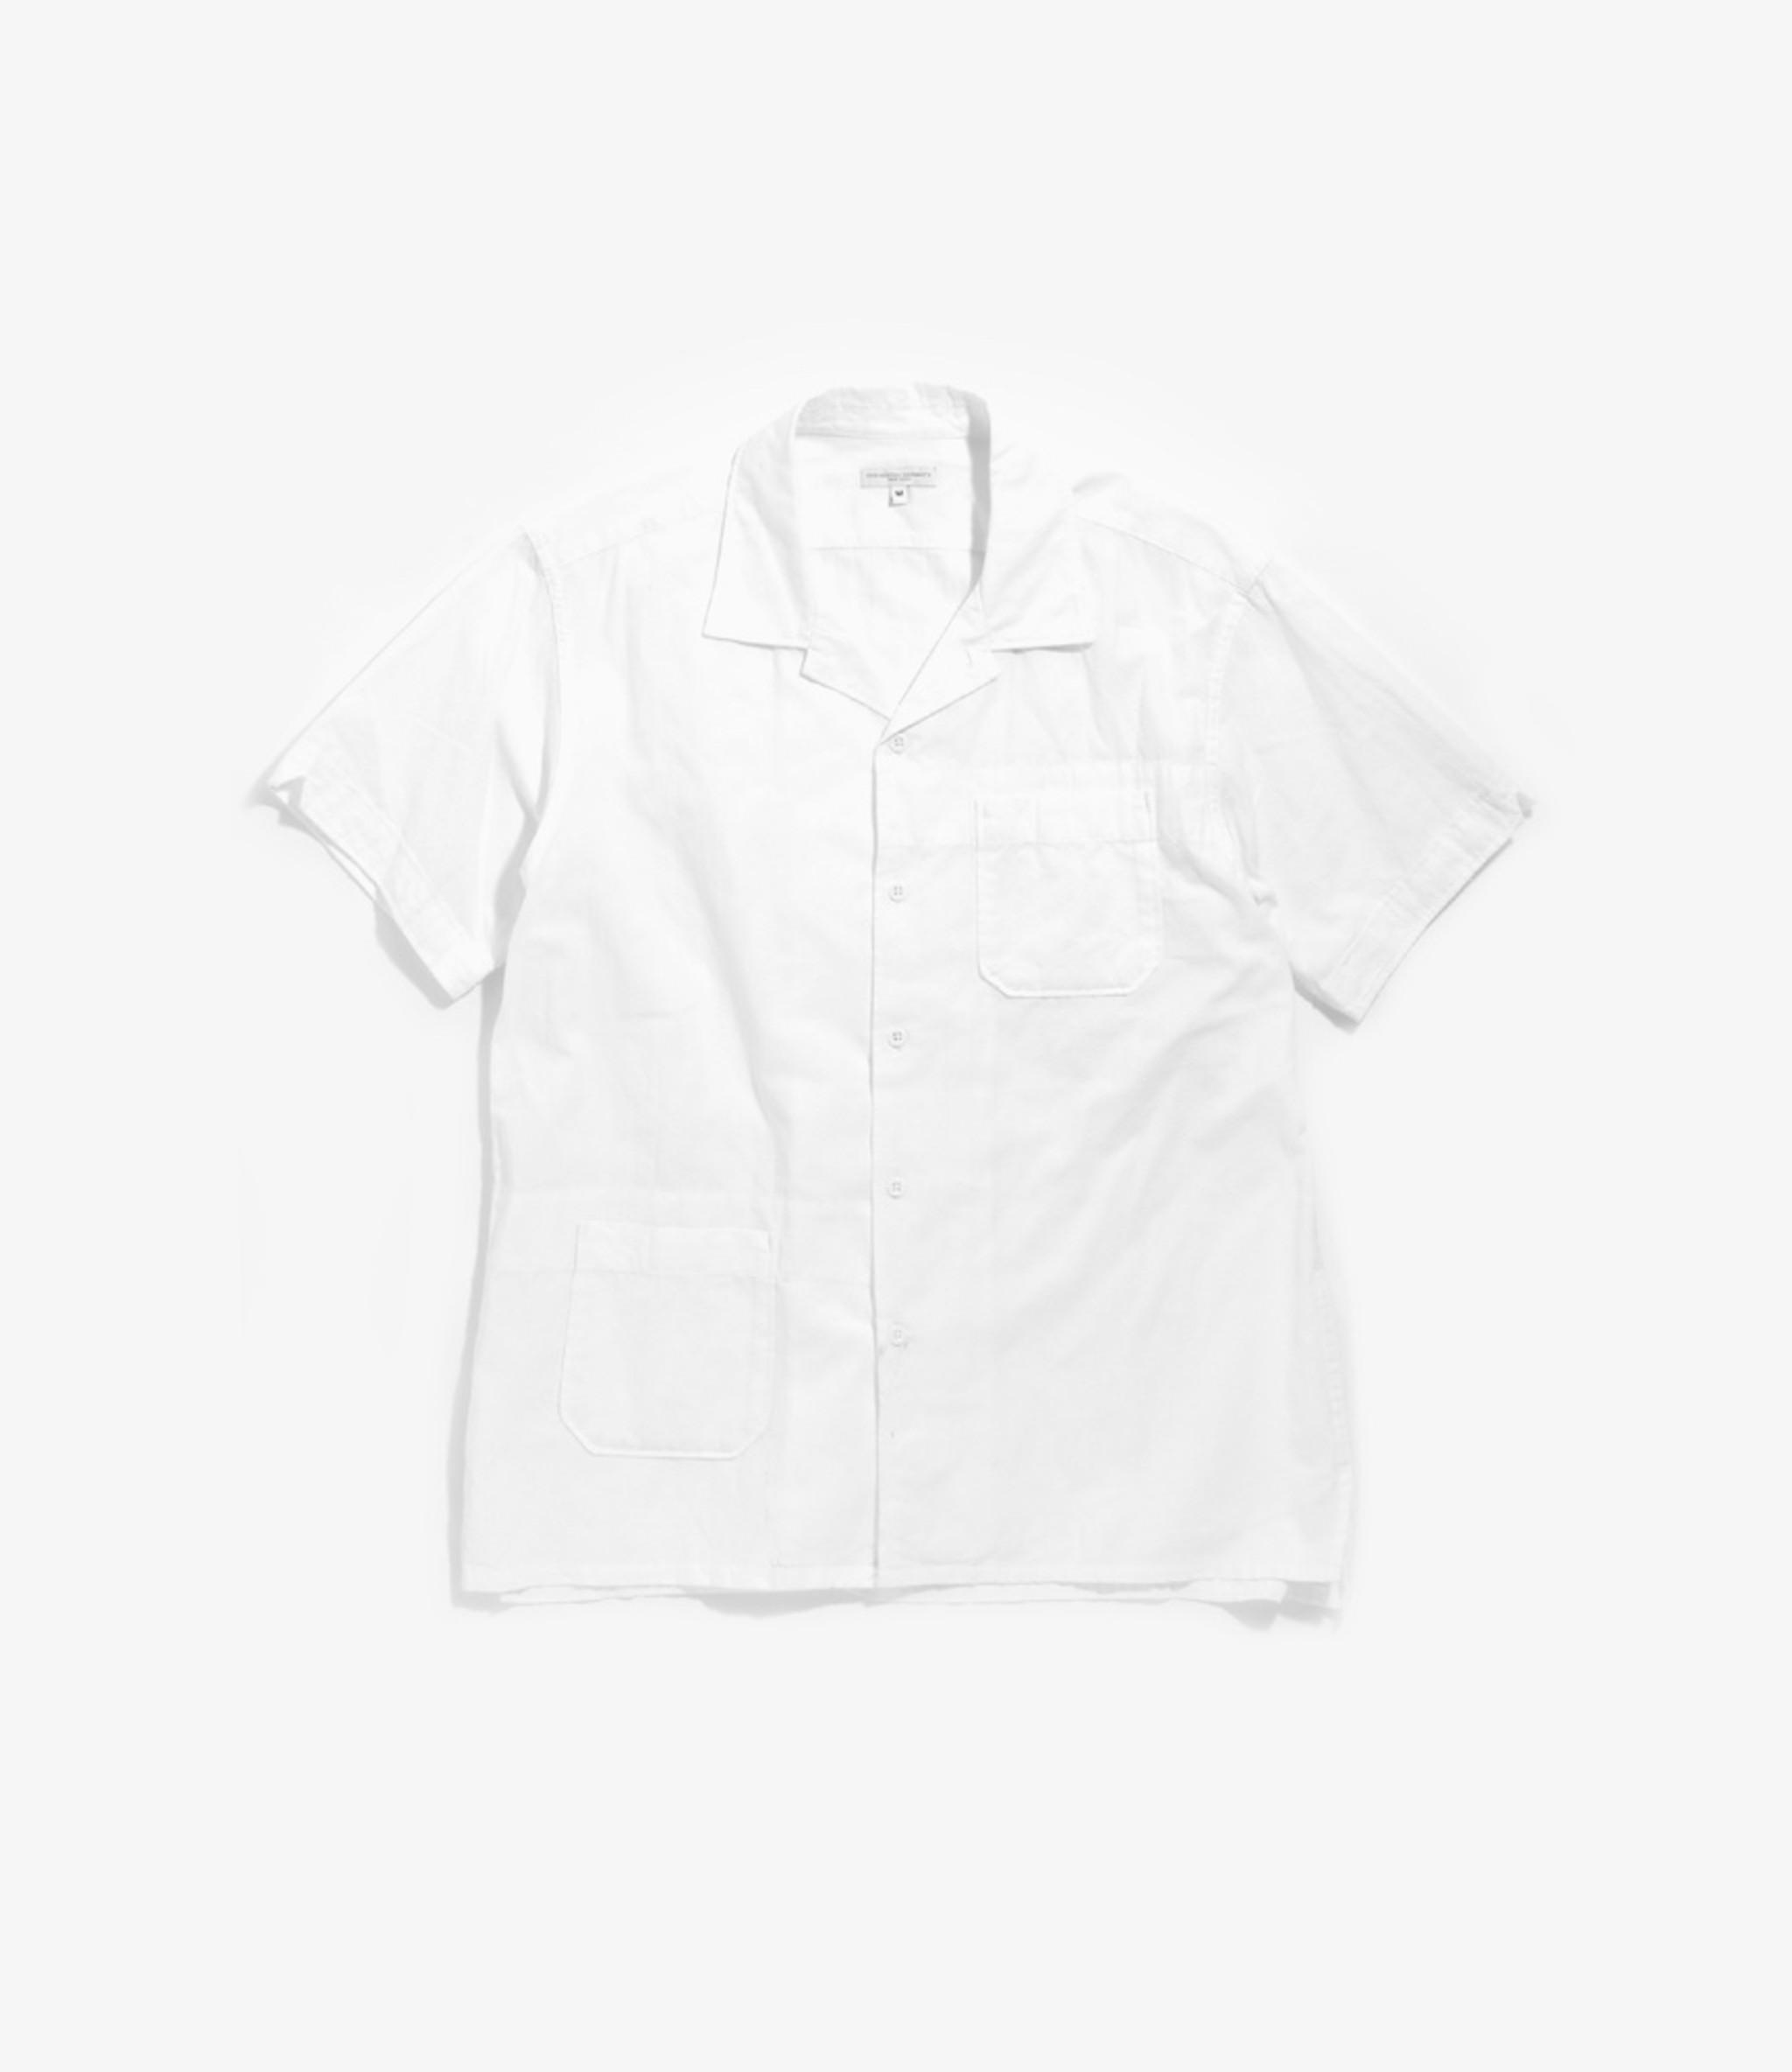 Engineered Garments Camp Shirt - White Cotton Dobby Stripe